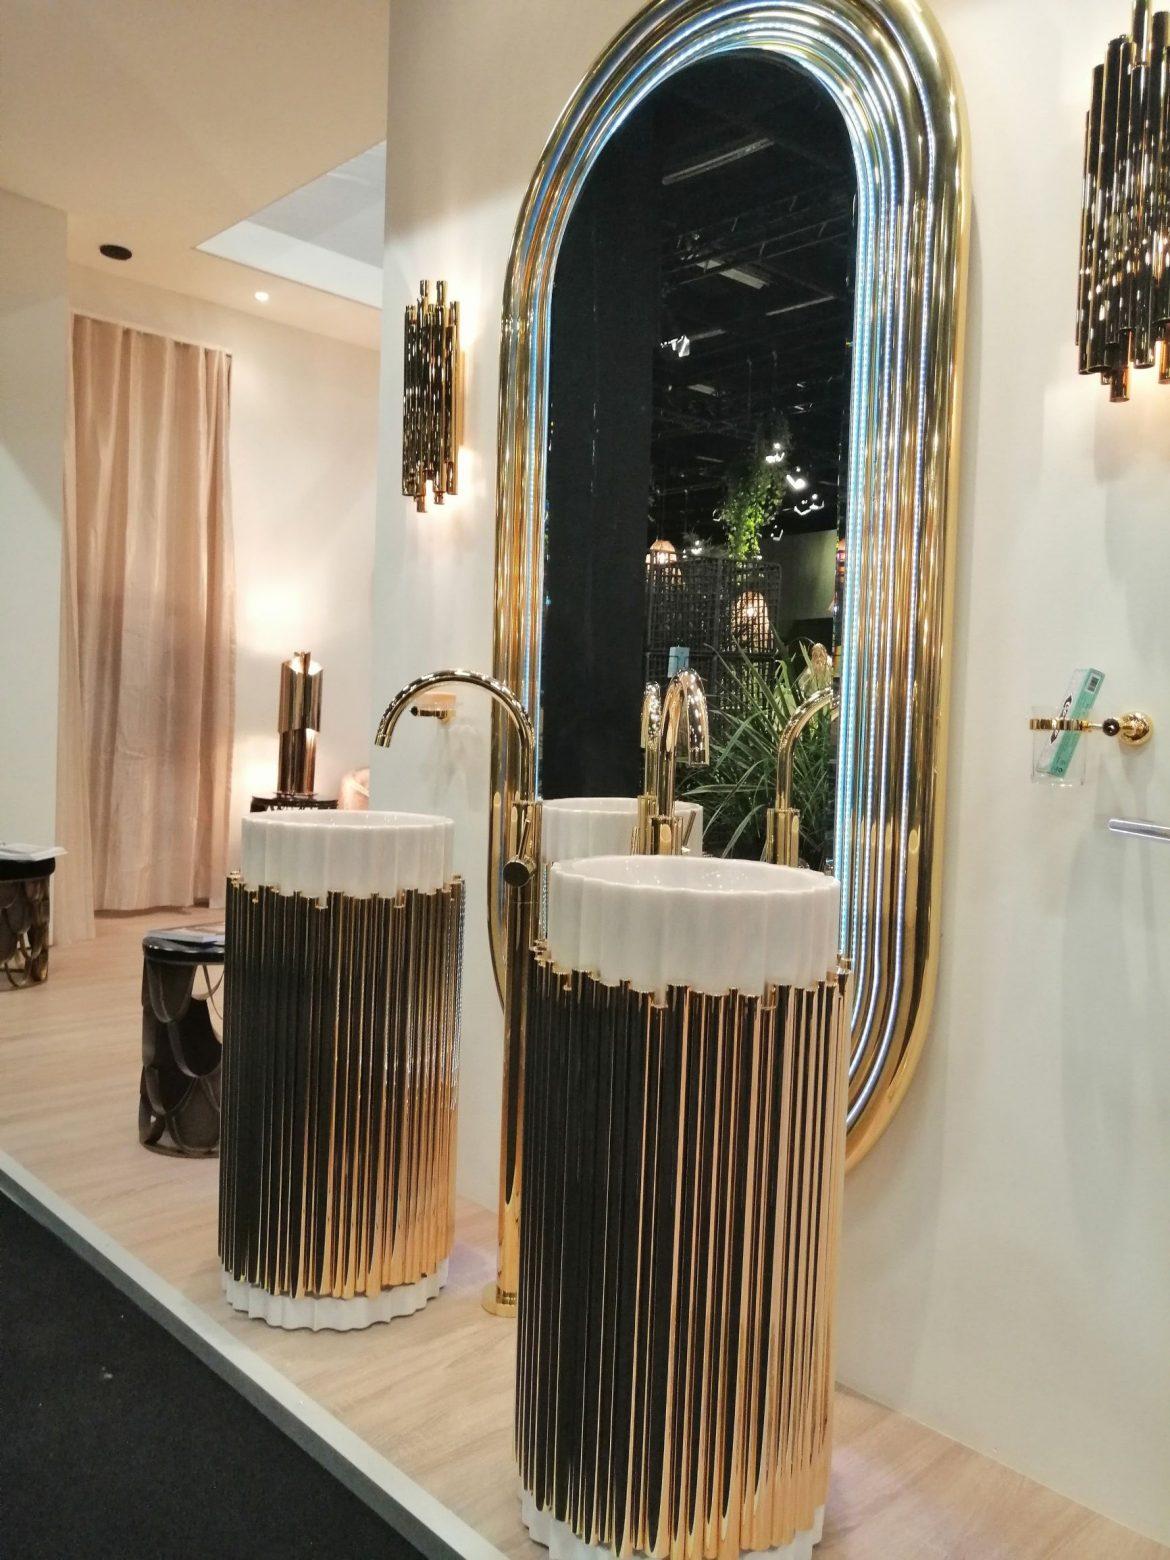 Luxuriöse Badezimmer im IMM Cologne 2020-Maison Valentina IMG 20200114 150611 1